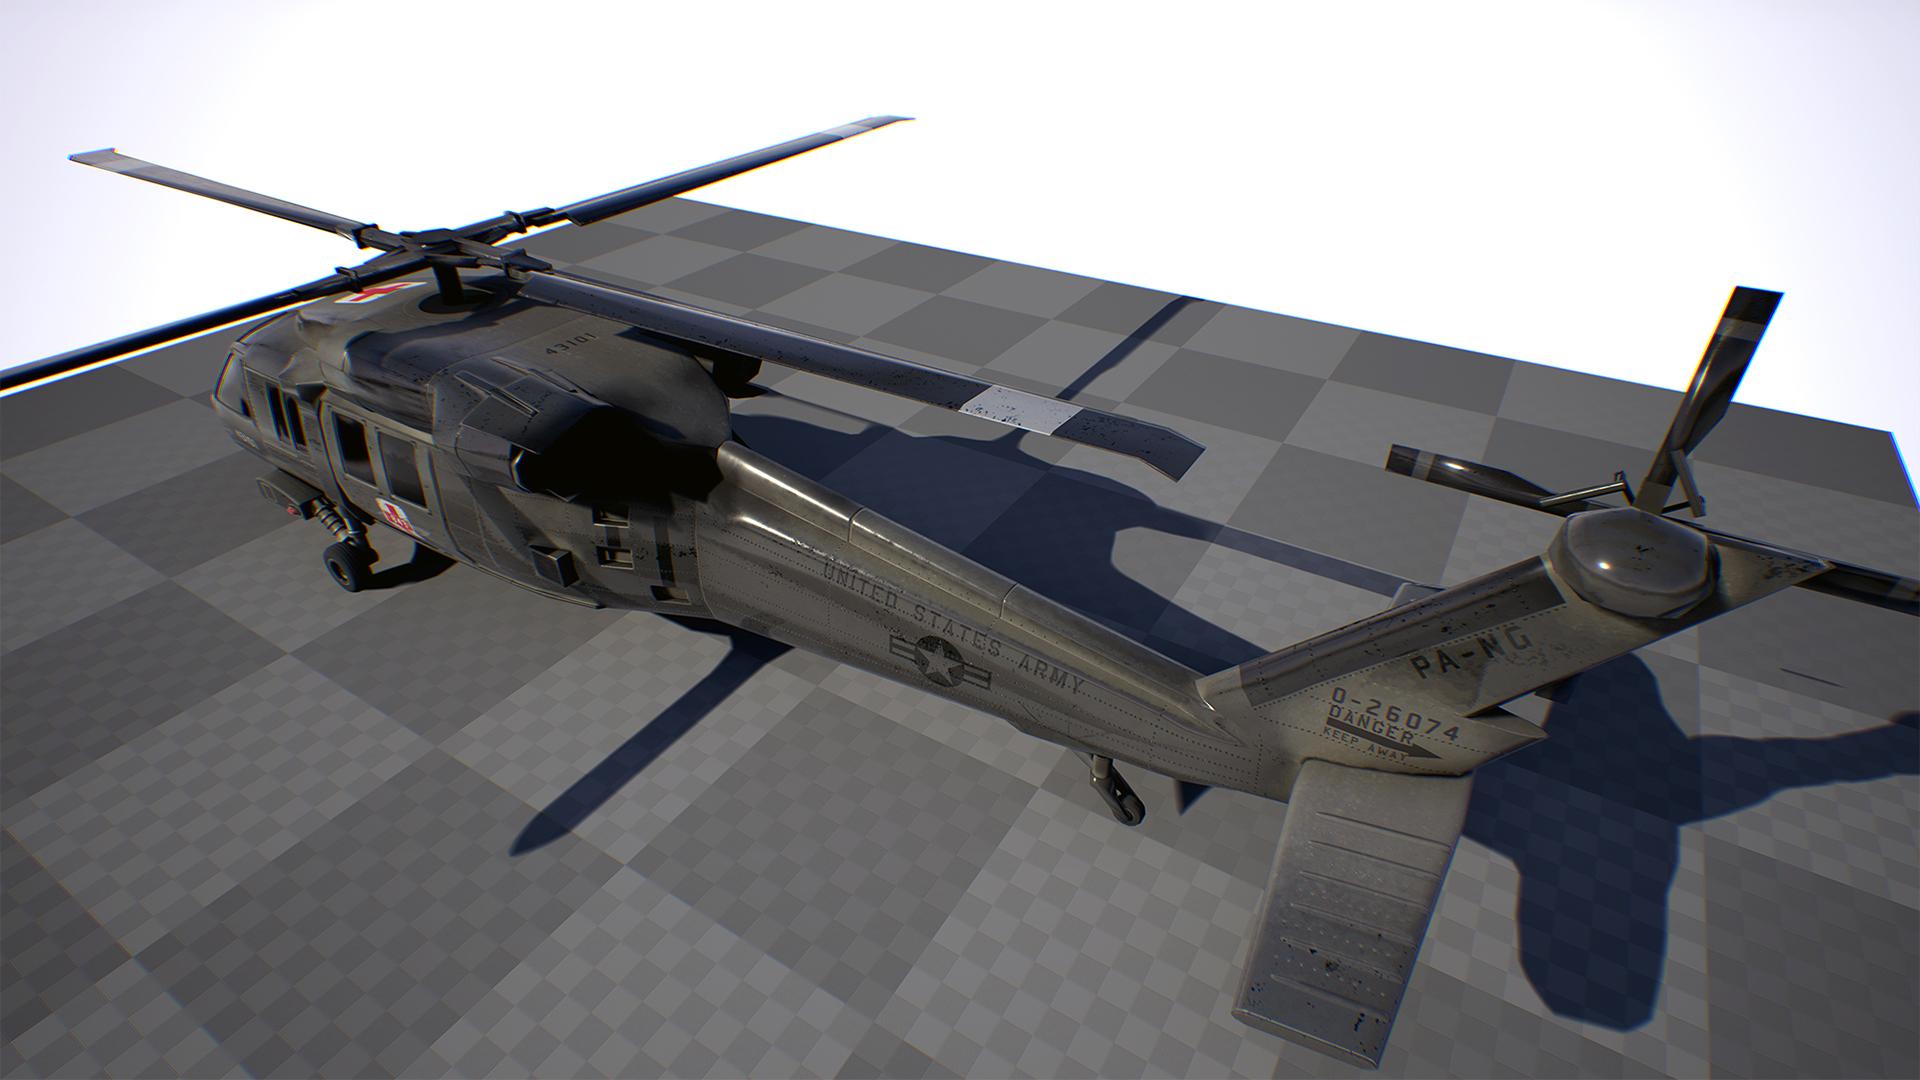 UH60M-blackhawk-04.jpg